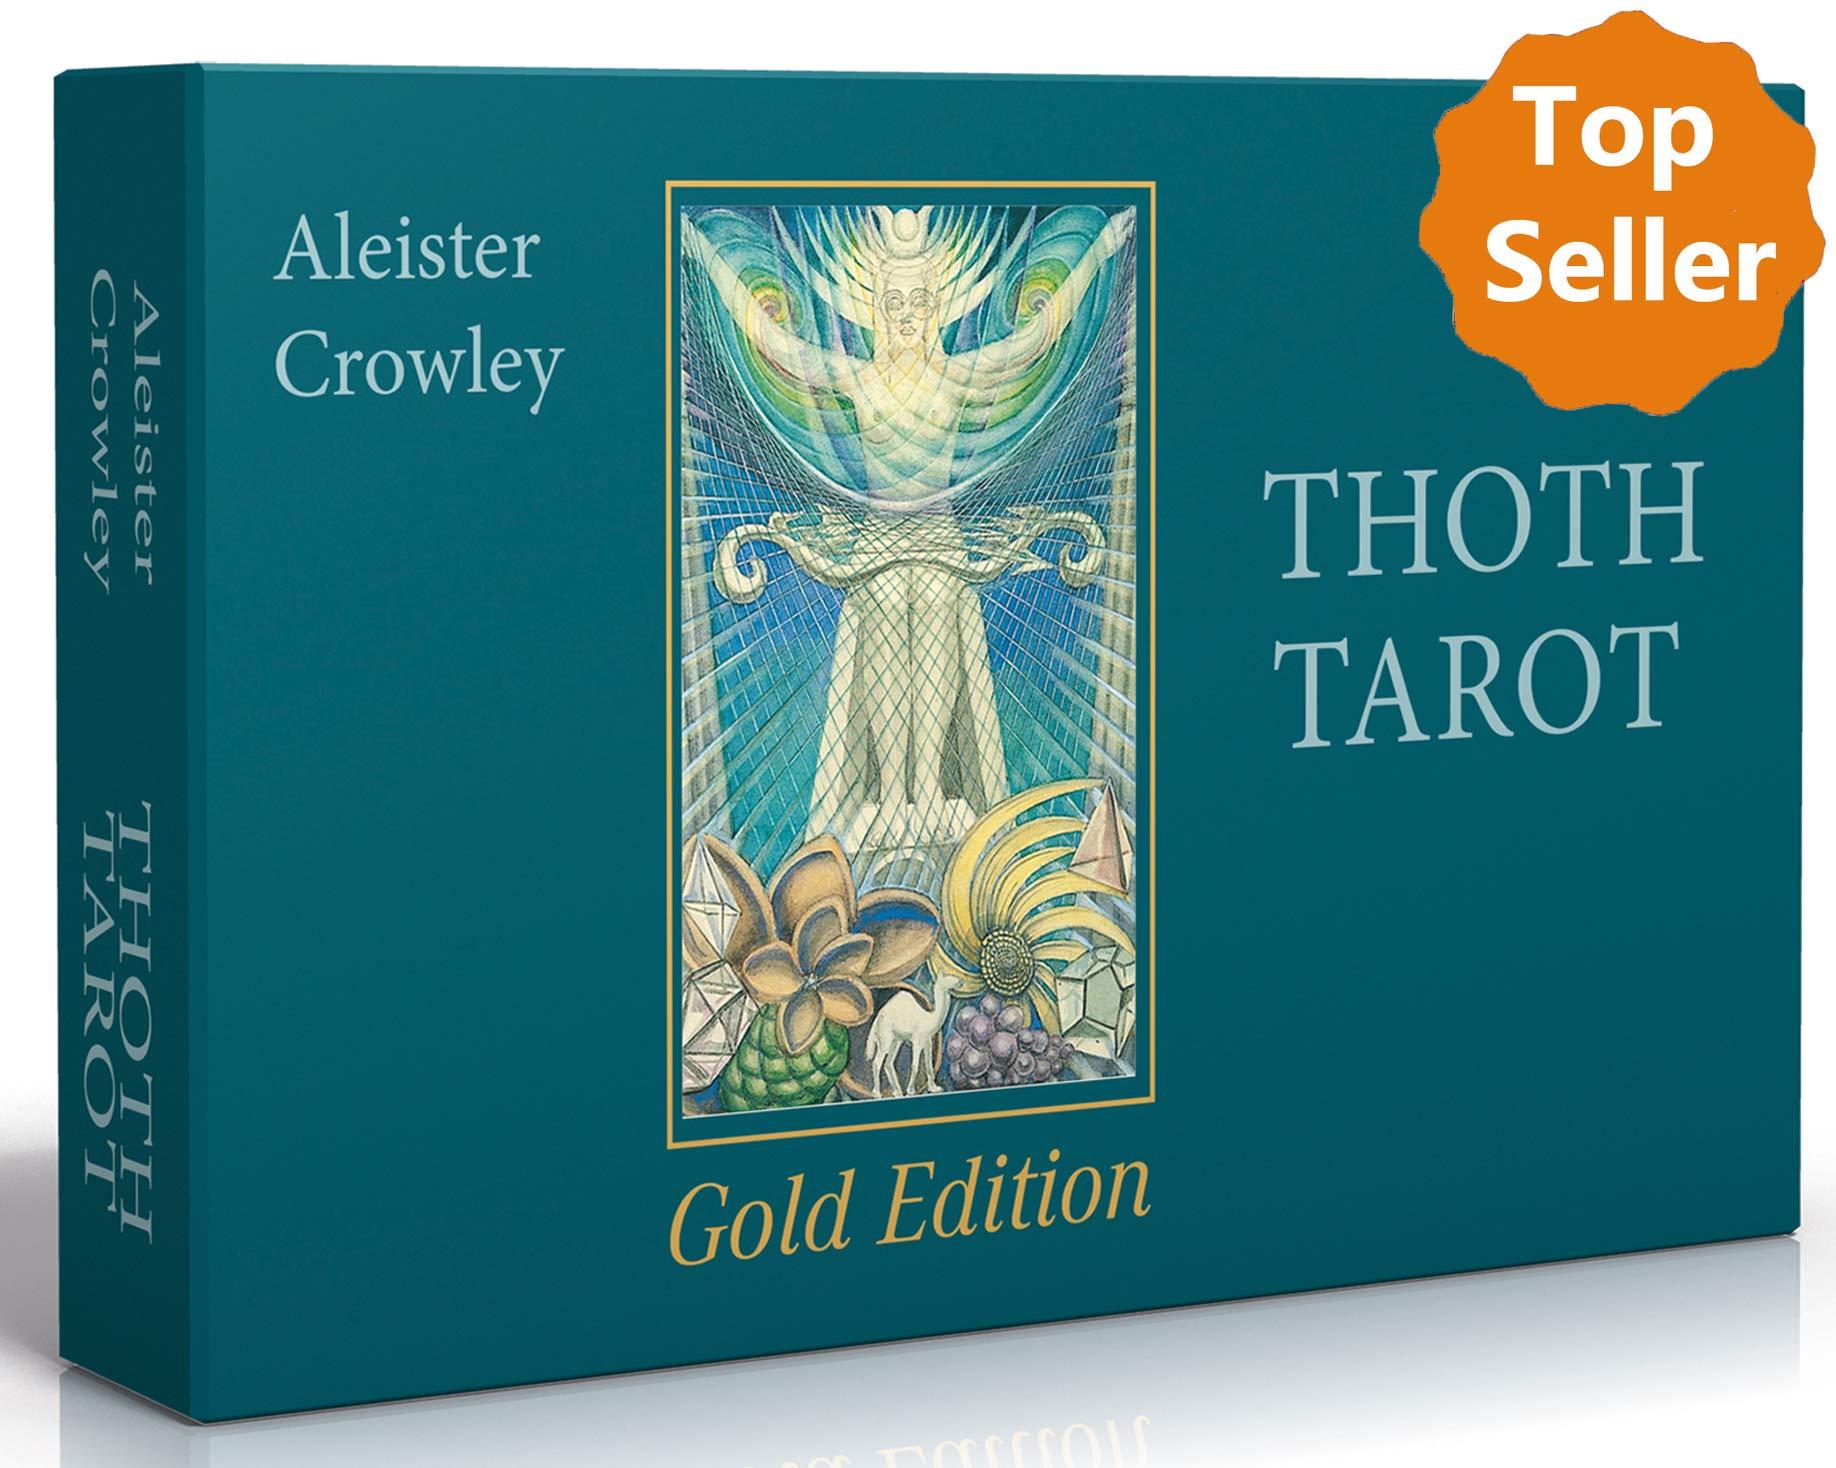 Aleister Crowley Thoth Tarot   Gold Edition  Deluxe Tarotkarten